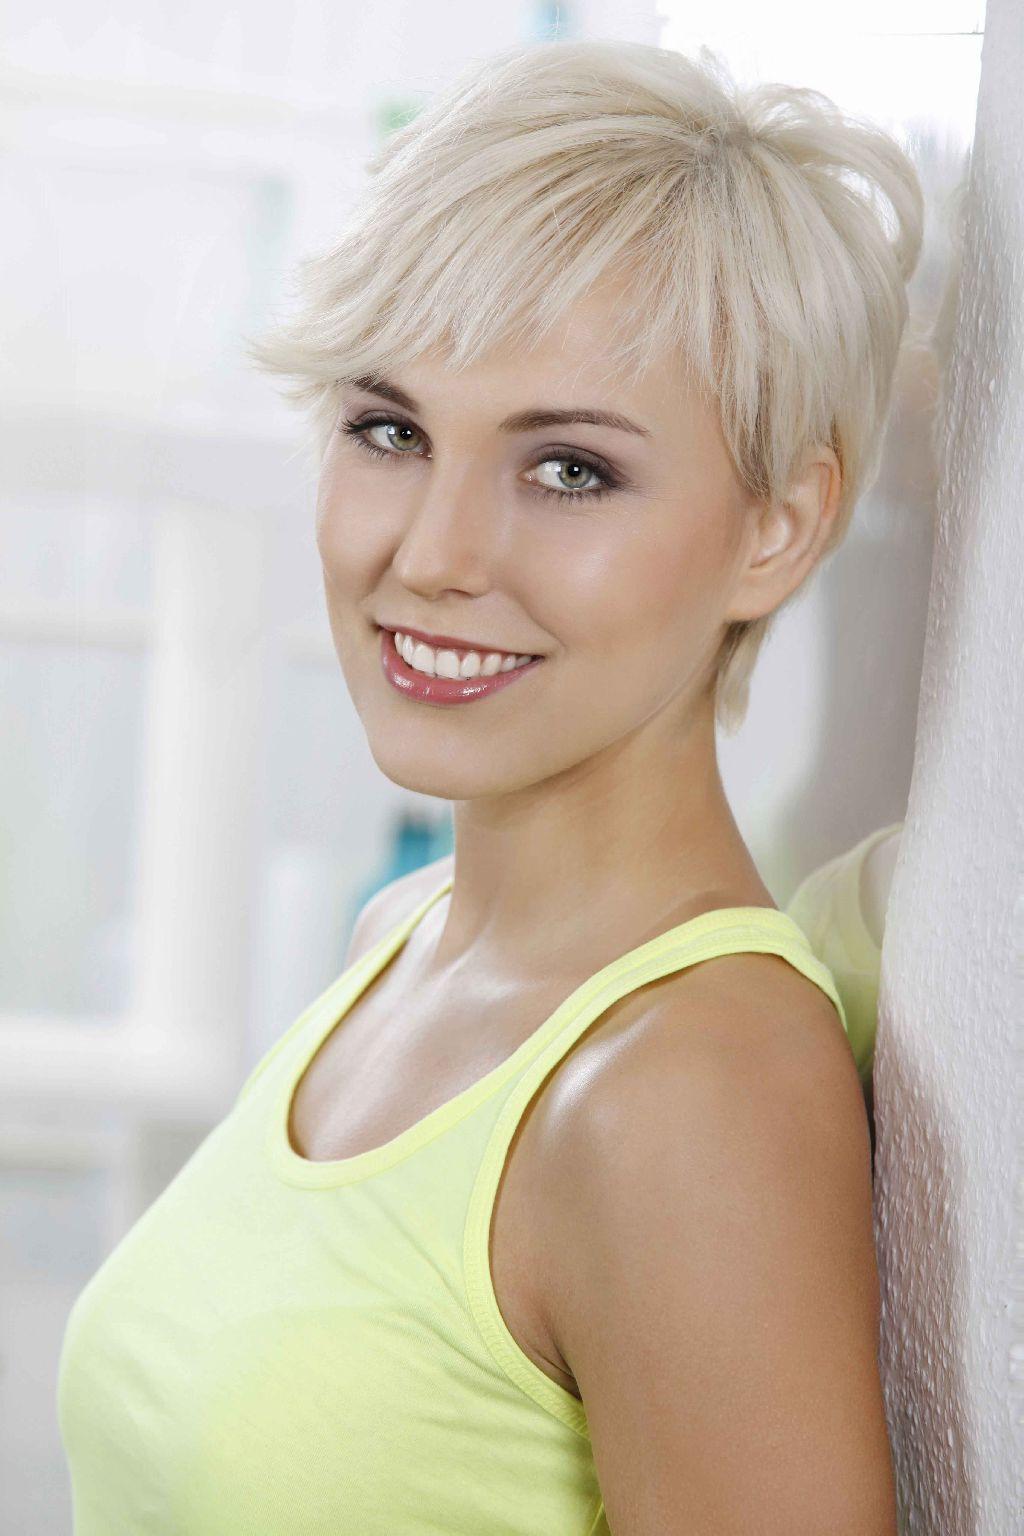 Sexy Short Blonde Hair – Hairstyle For Women & Man Regarding Short Blonde Hair With Bangs (View 9 of 25)